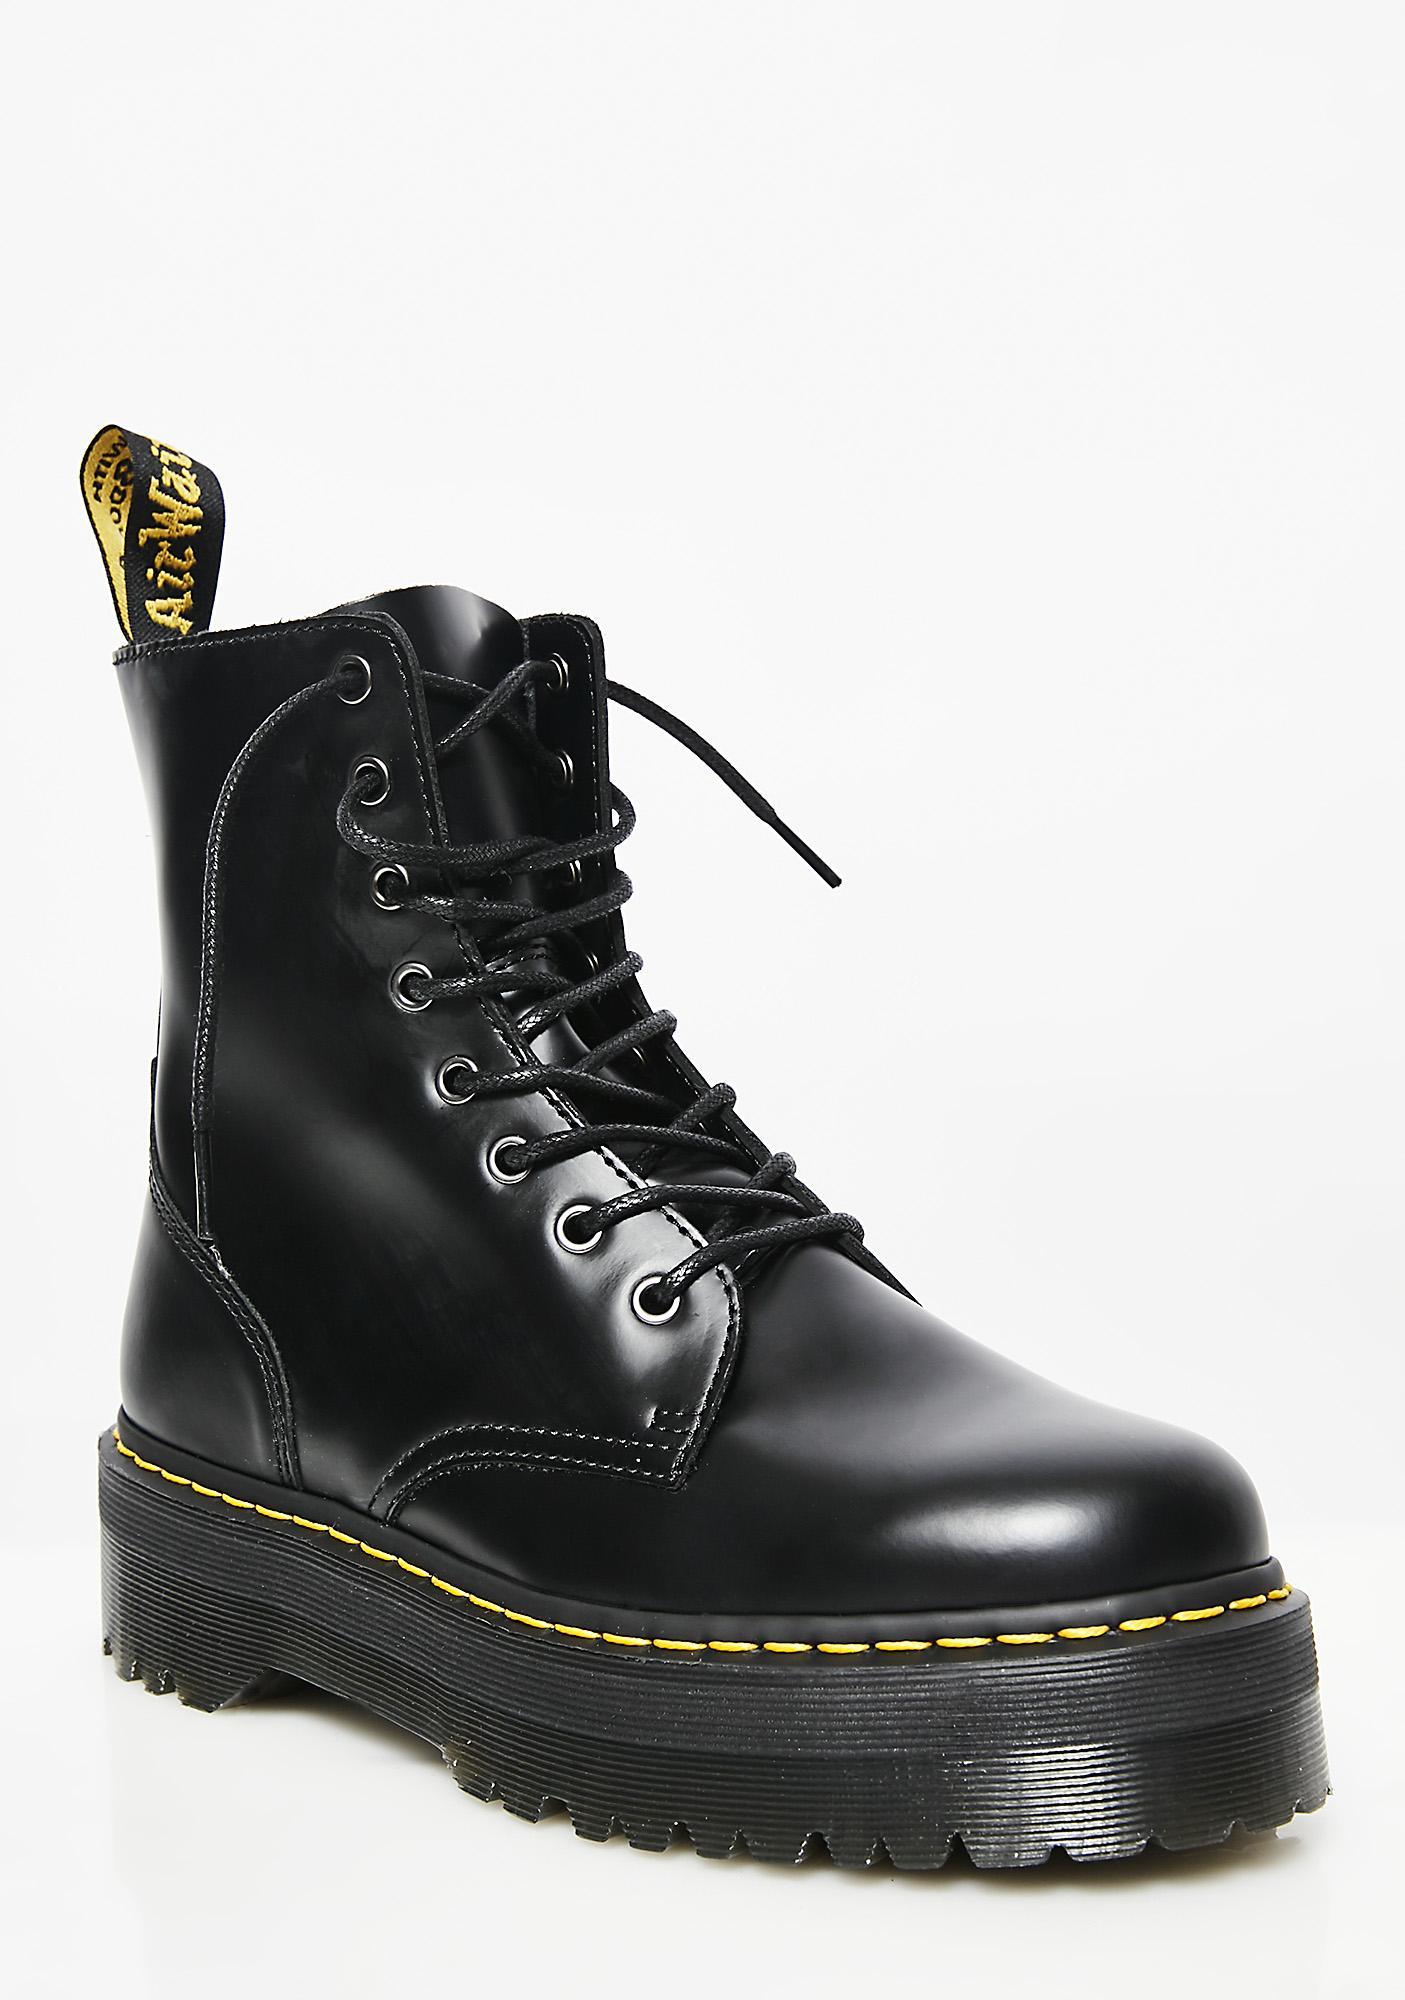 e97ba890537 ... Dr. Martens Jadon 8 Eye Boots ...